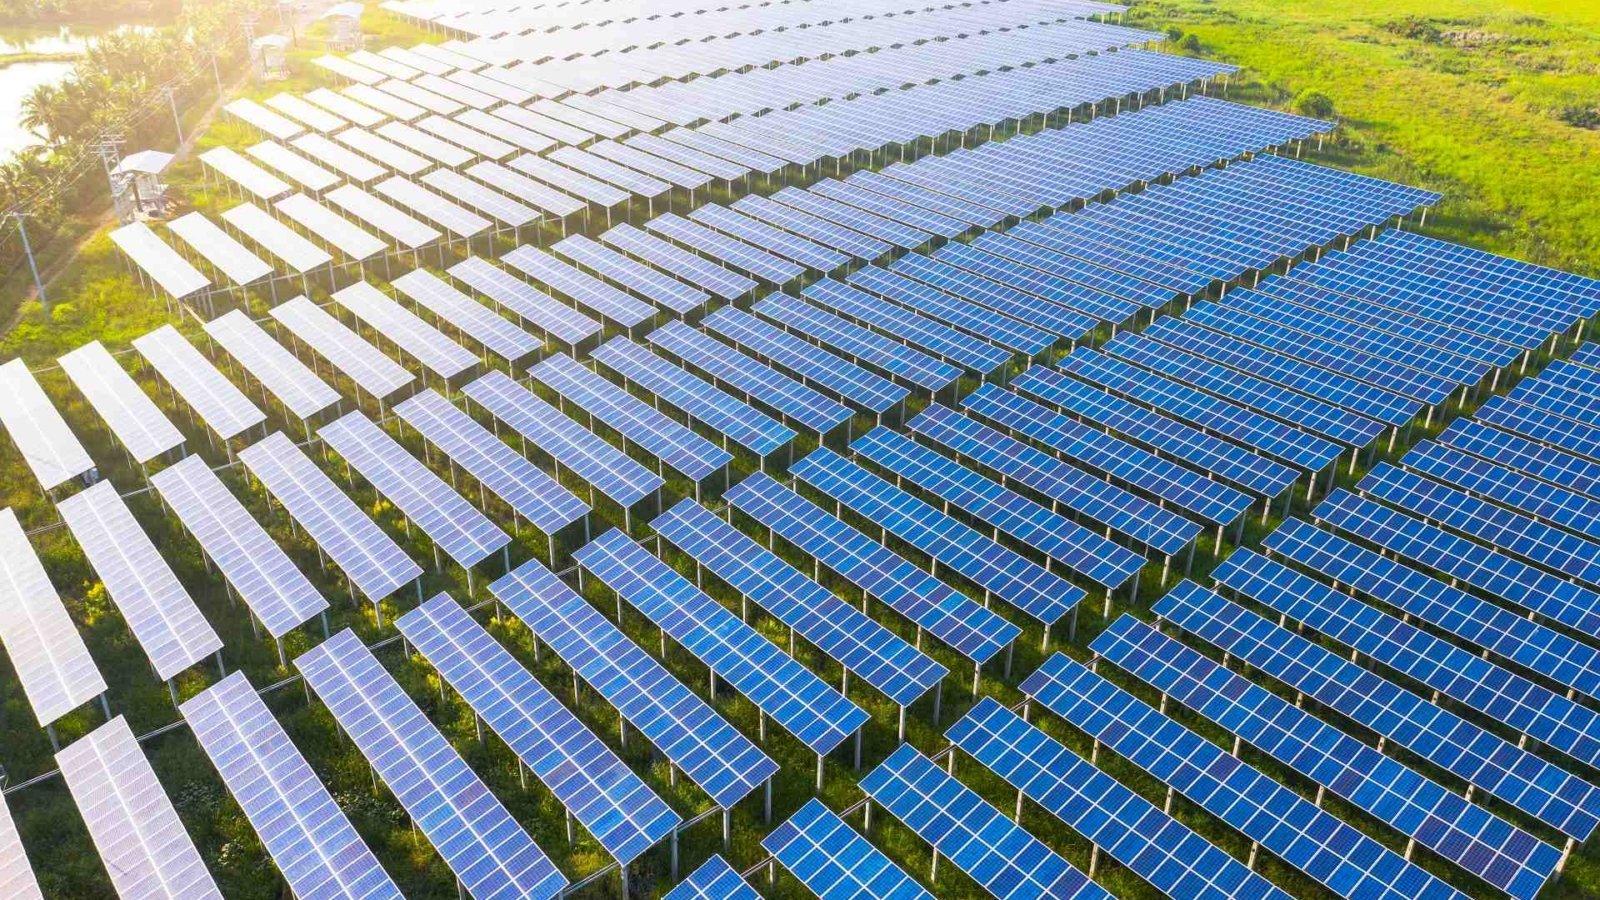 energias-renovaveis-img-2020 (2)-compressed